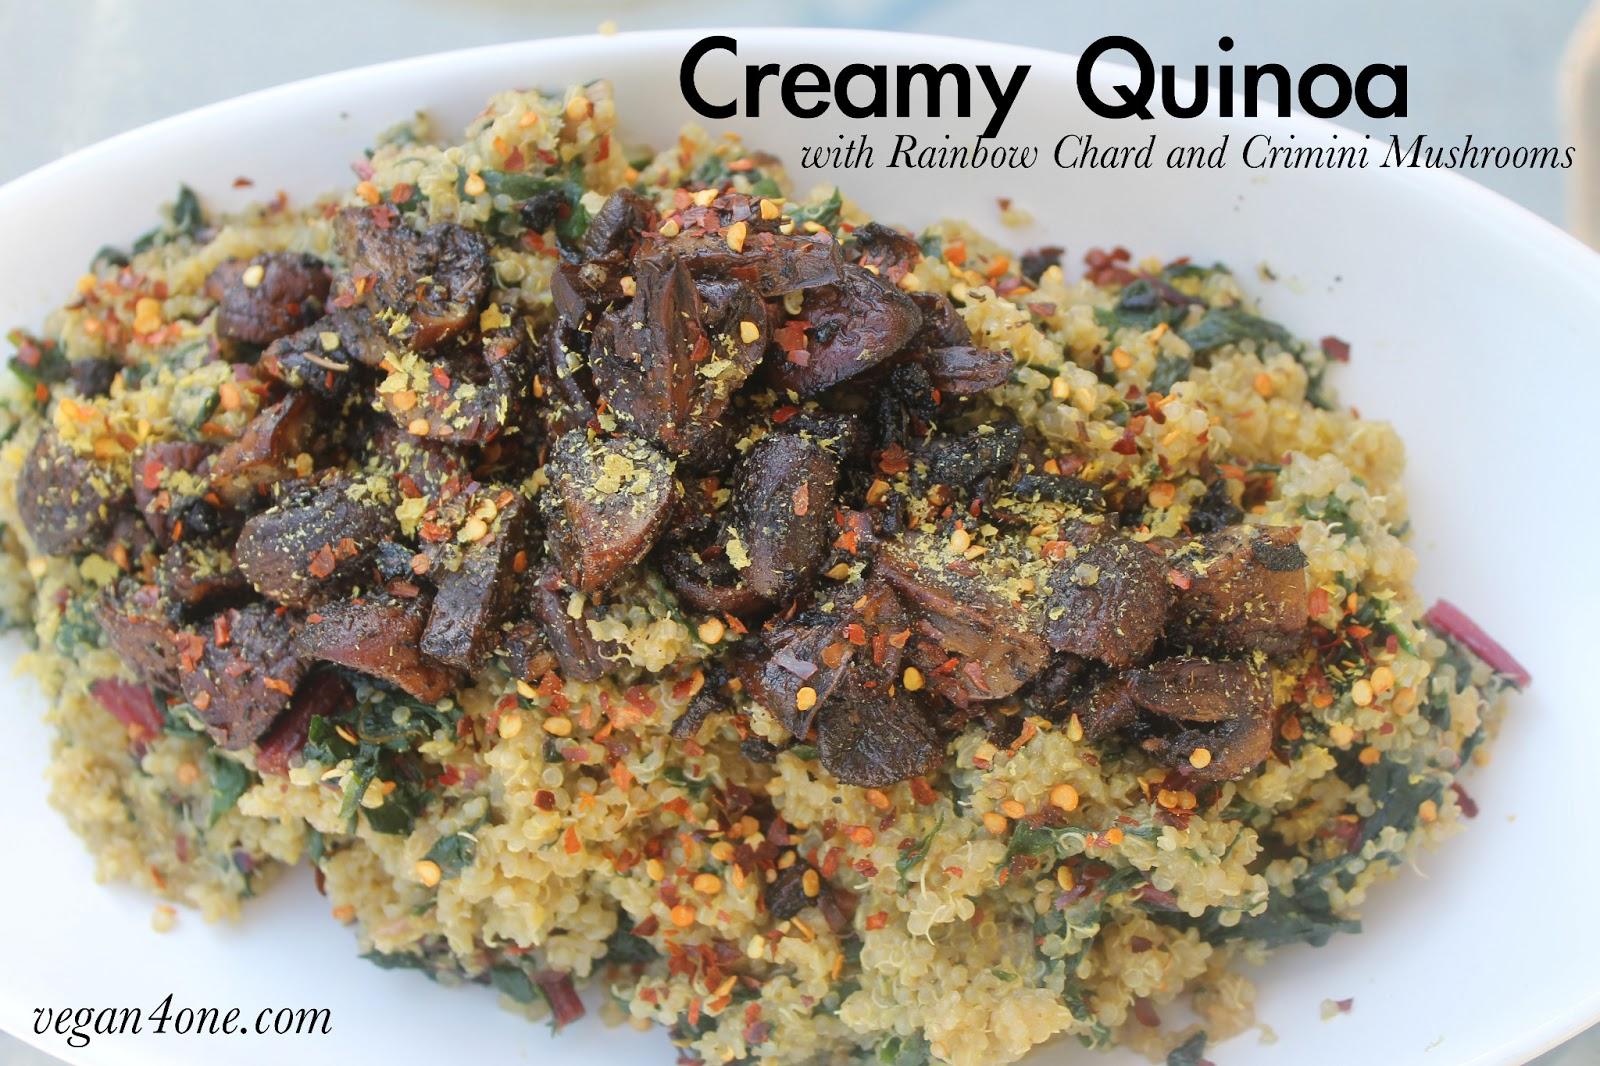 Creamy Quinoa with Rainbow Swiss Chard and Crimini Mushrooms